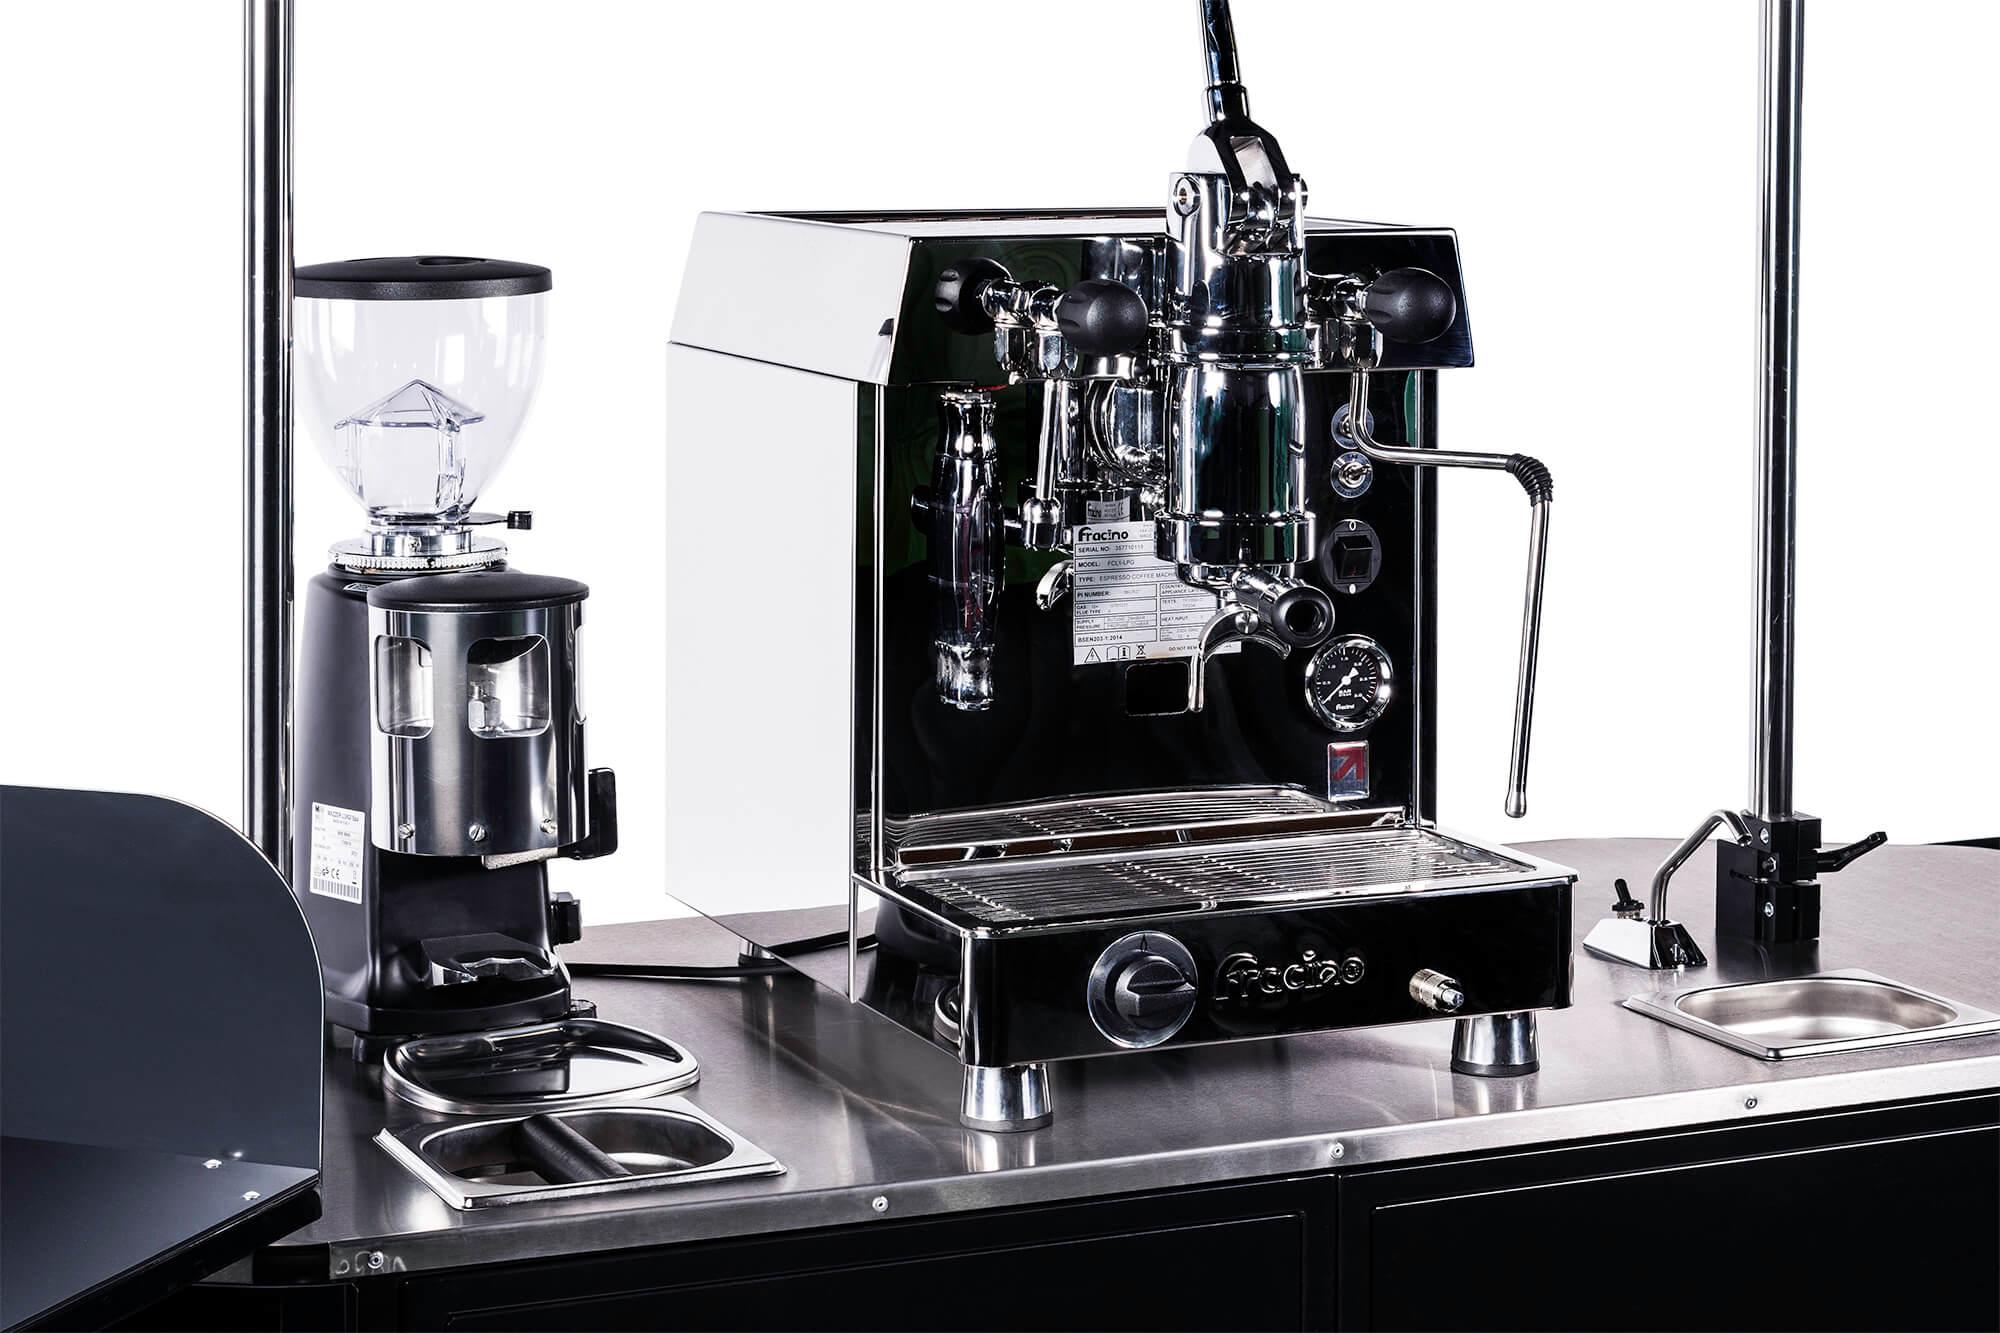 Premium coffee cart countertop close-up